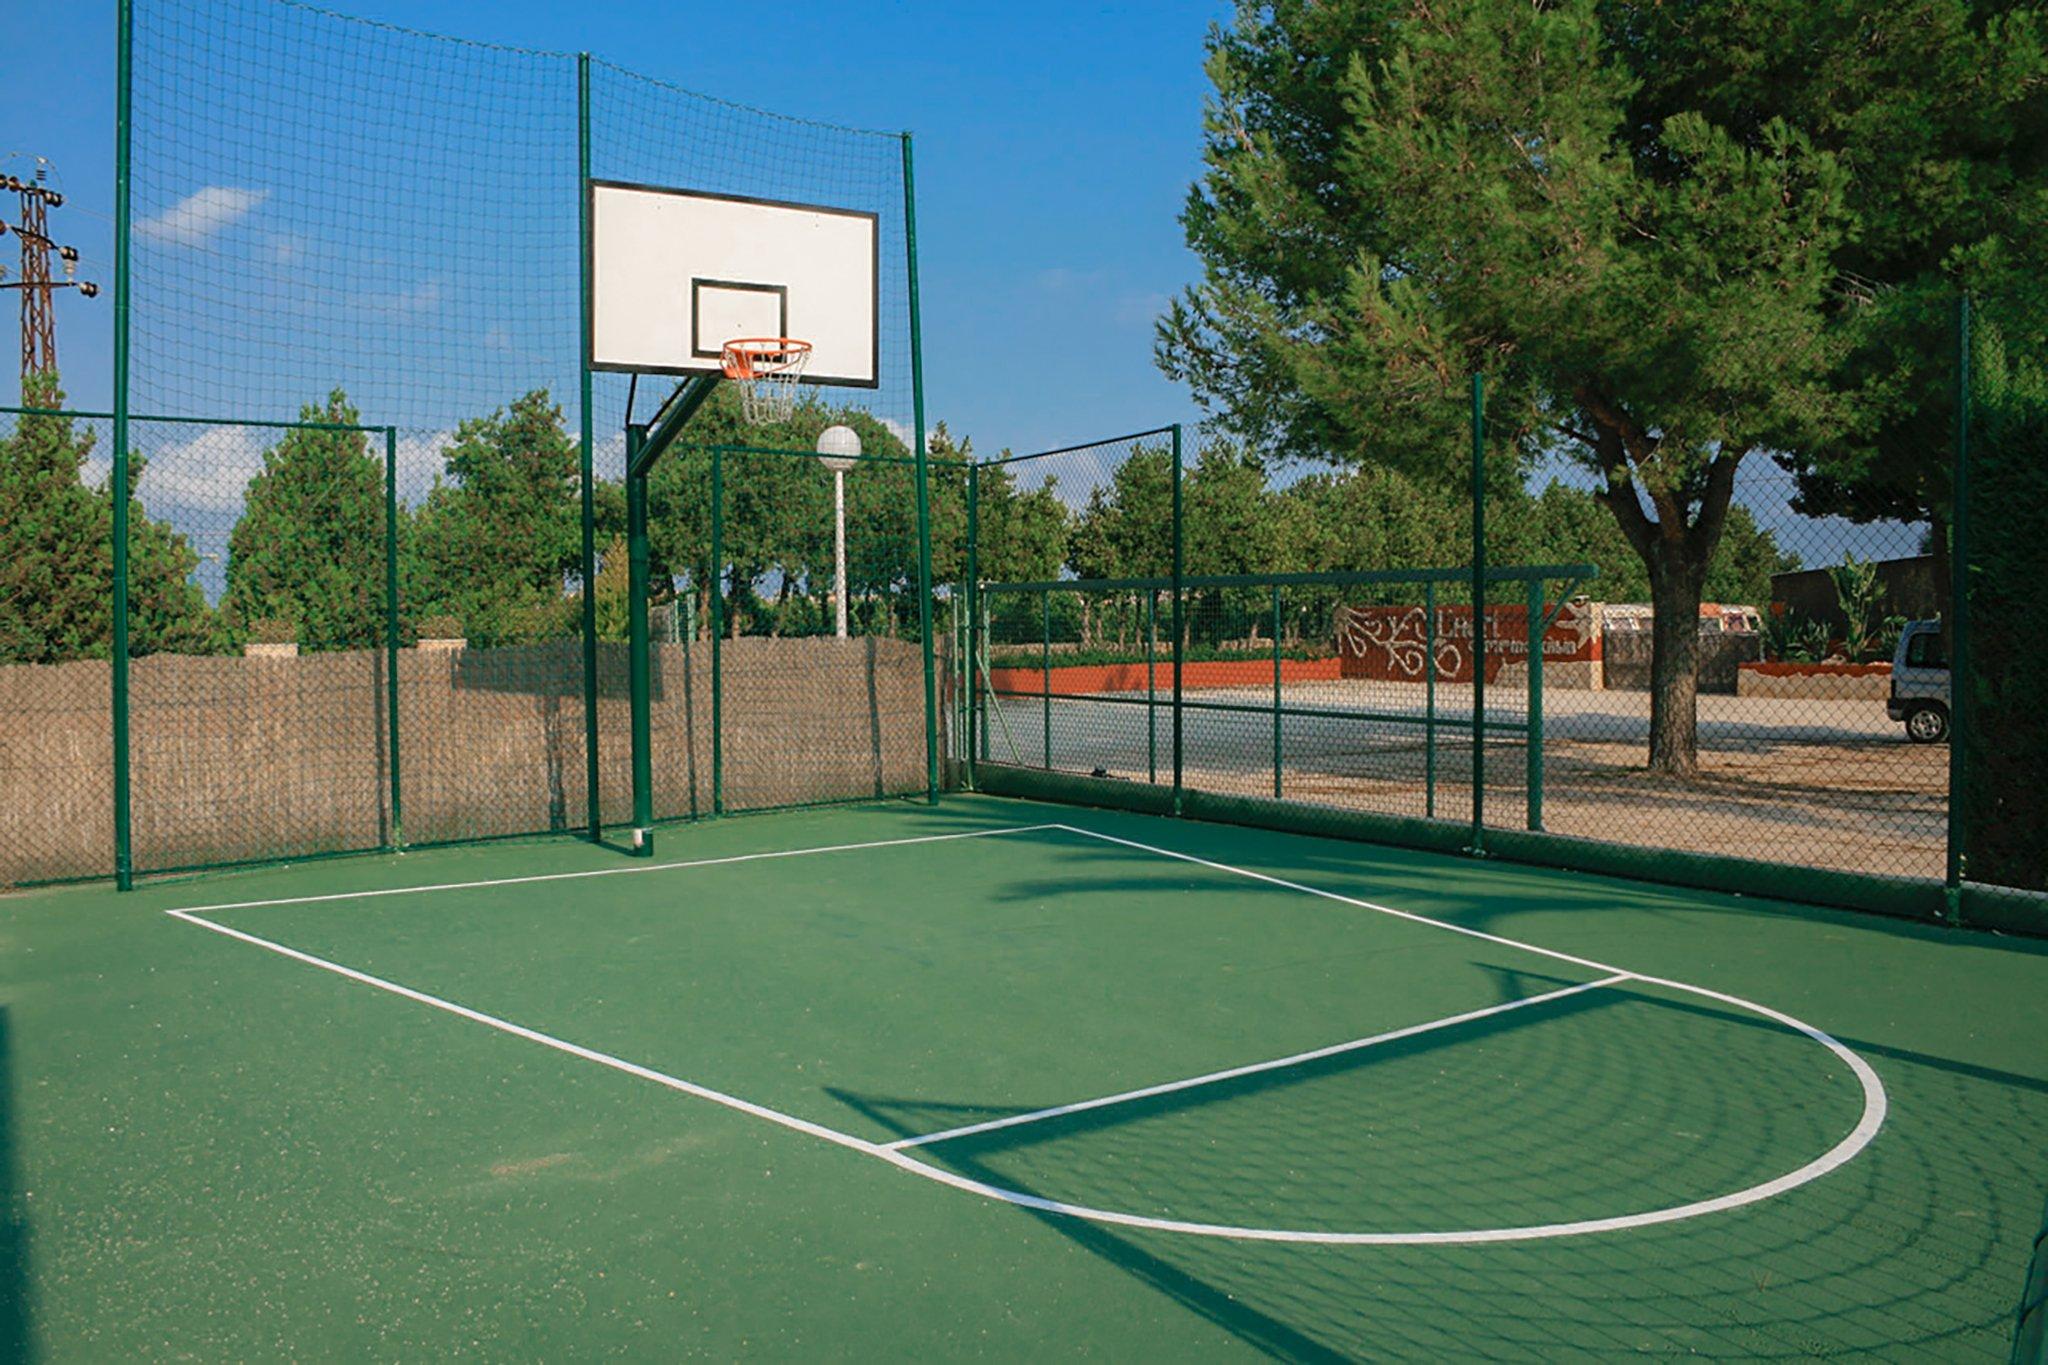 Pista de basket – Camping Jávea